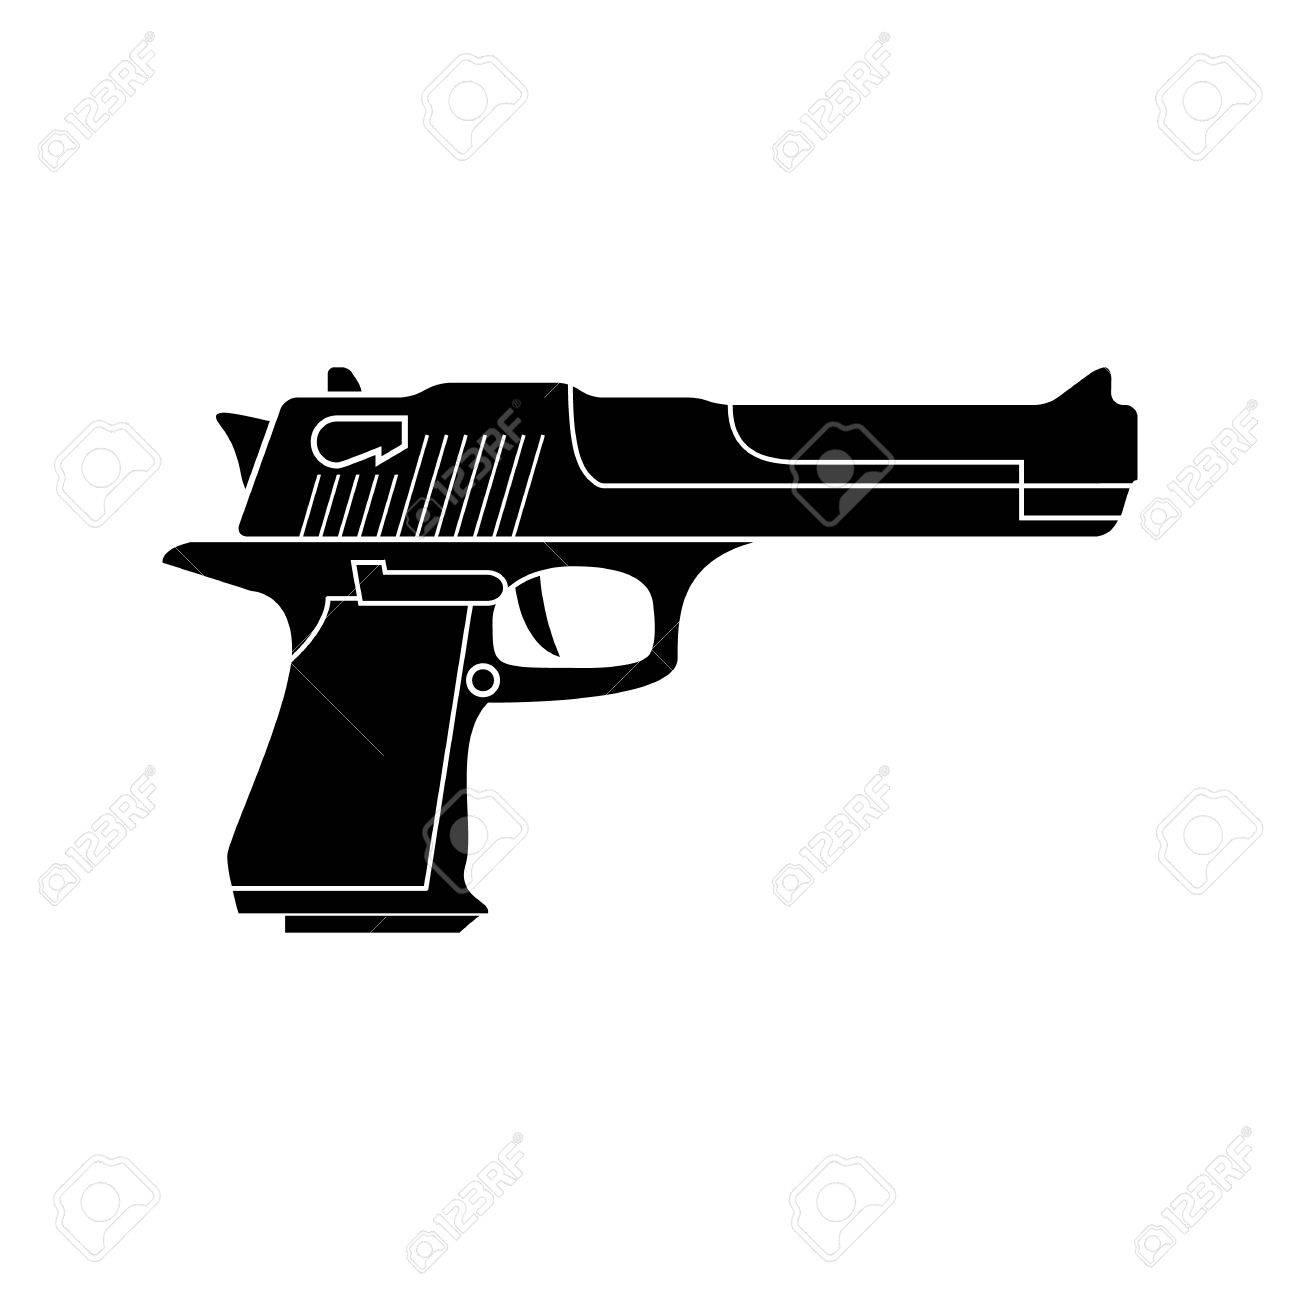 powerful pistol gun handgun vector black simple icon flat royalty free cliparts vectors and stock illustration image 59947276 powerful pistol gun handgun vector black simple icon flat